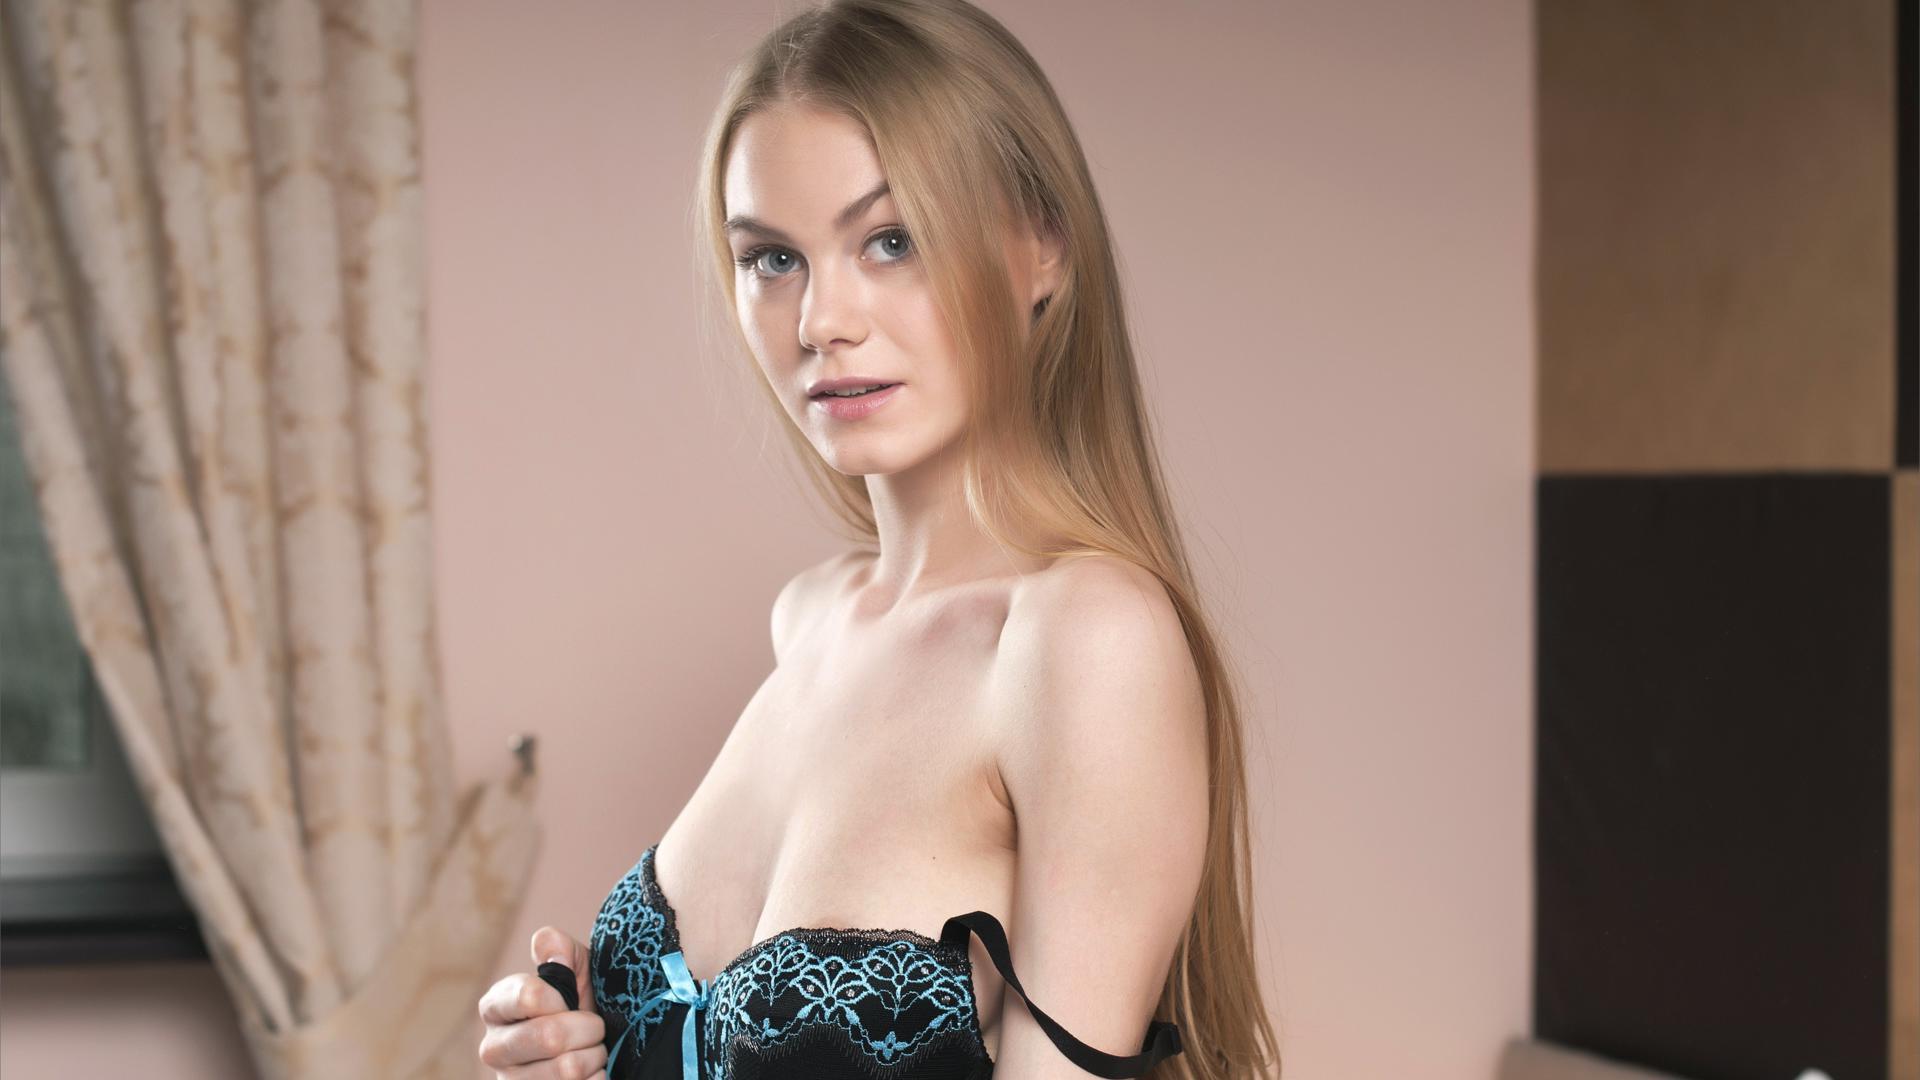 Download photo 1920x1080, nikia a, sexy girl, adult model